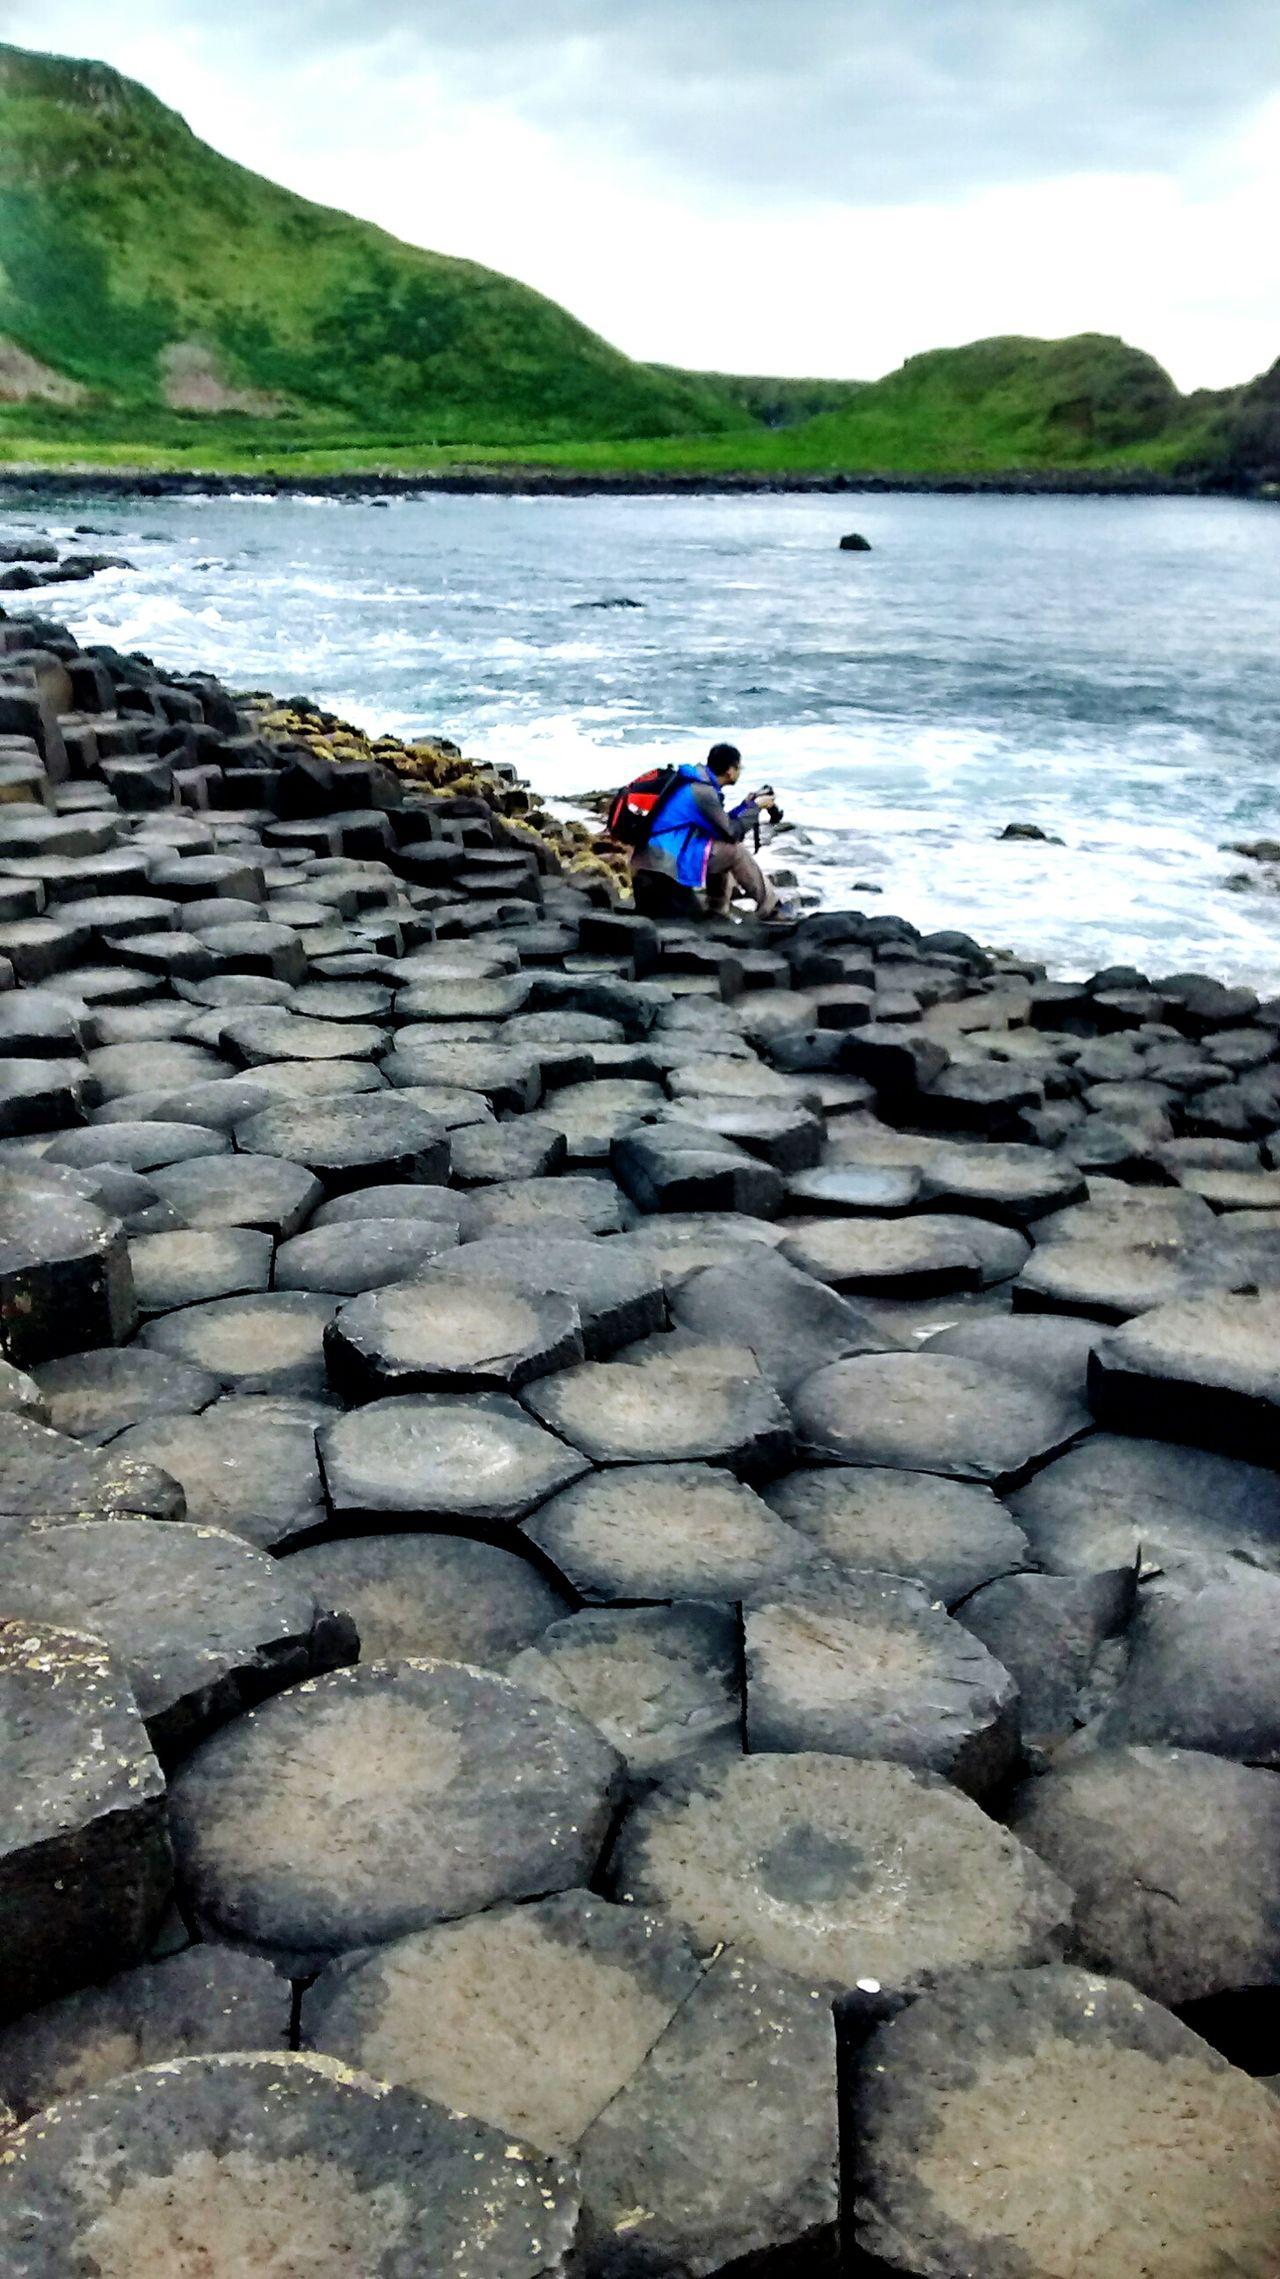 Of Unraveled Mysteries.. The Tourist #Ireland #stones Preciousstones #Hexagonal #HexagonalStones #Hexagon Nature